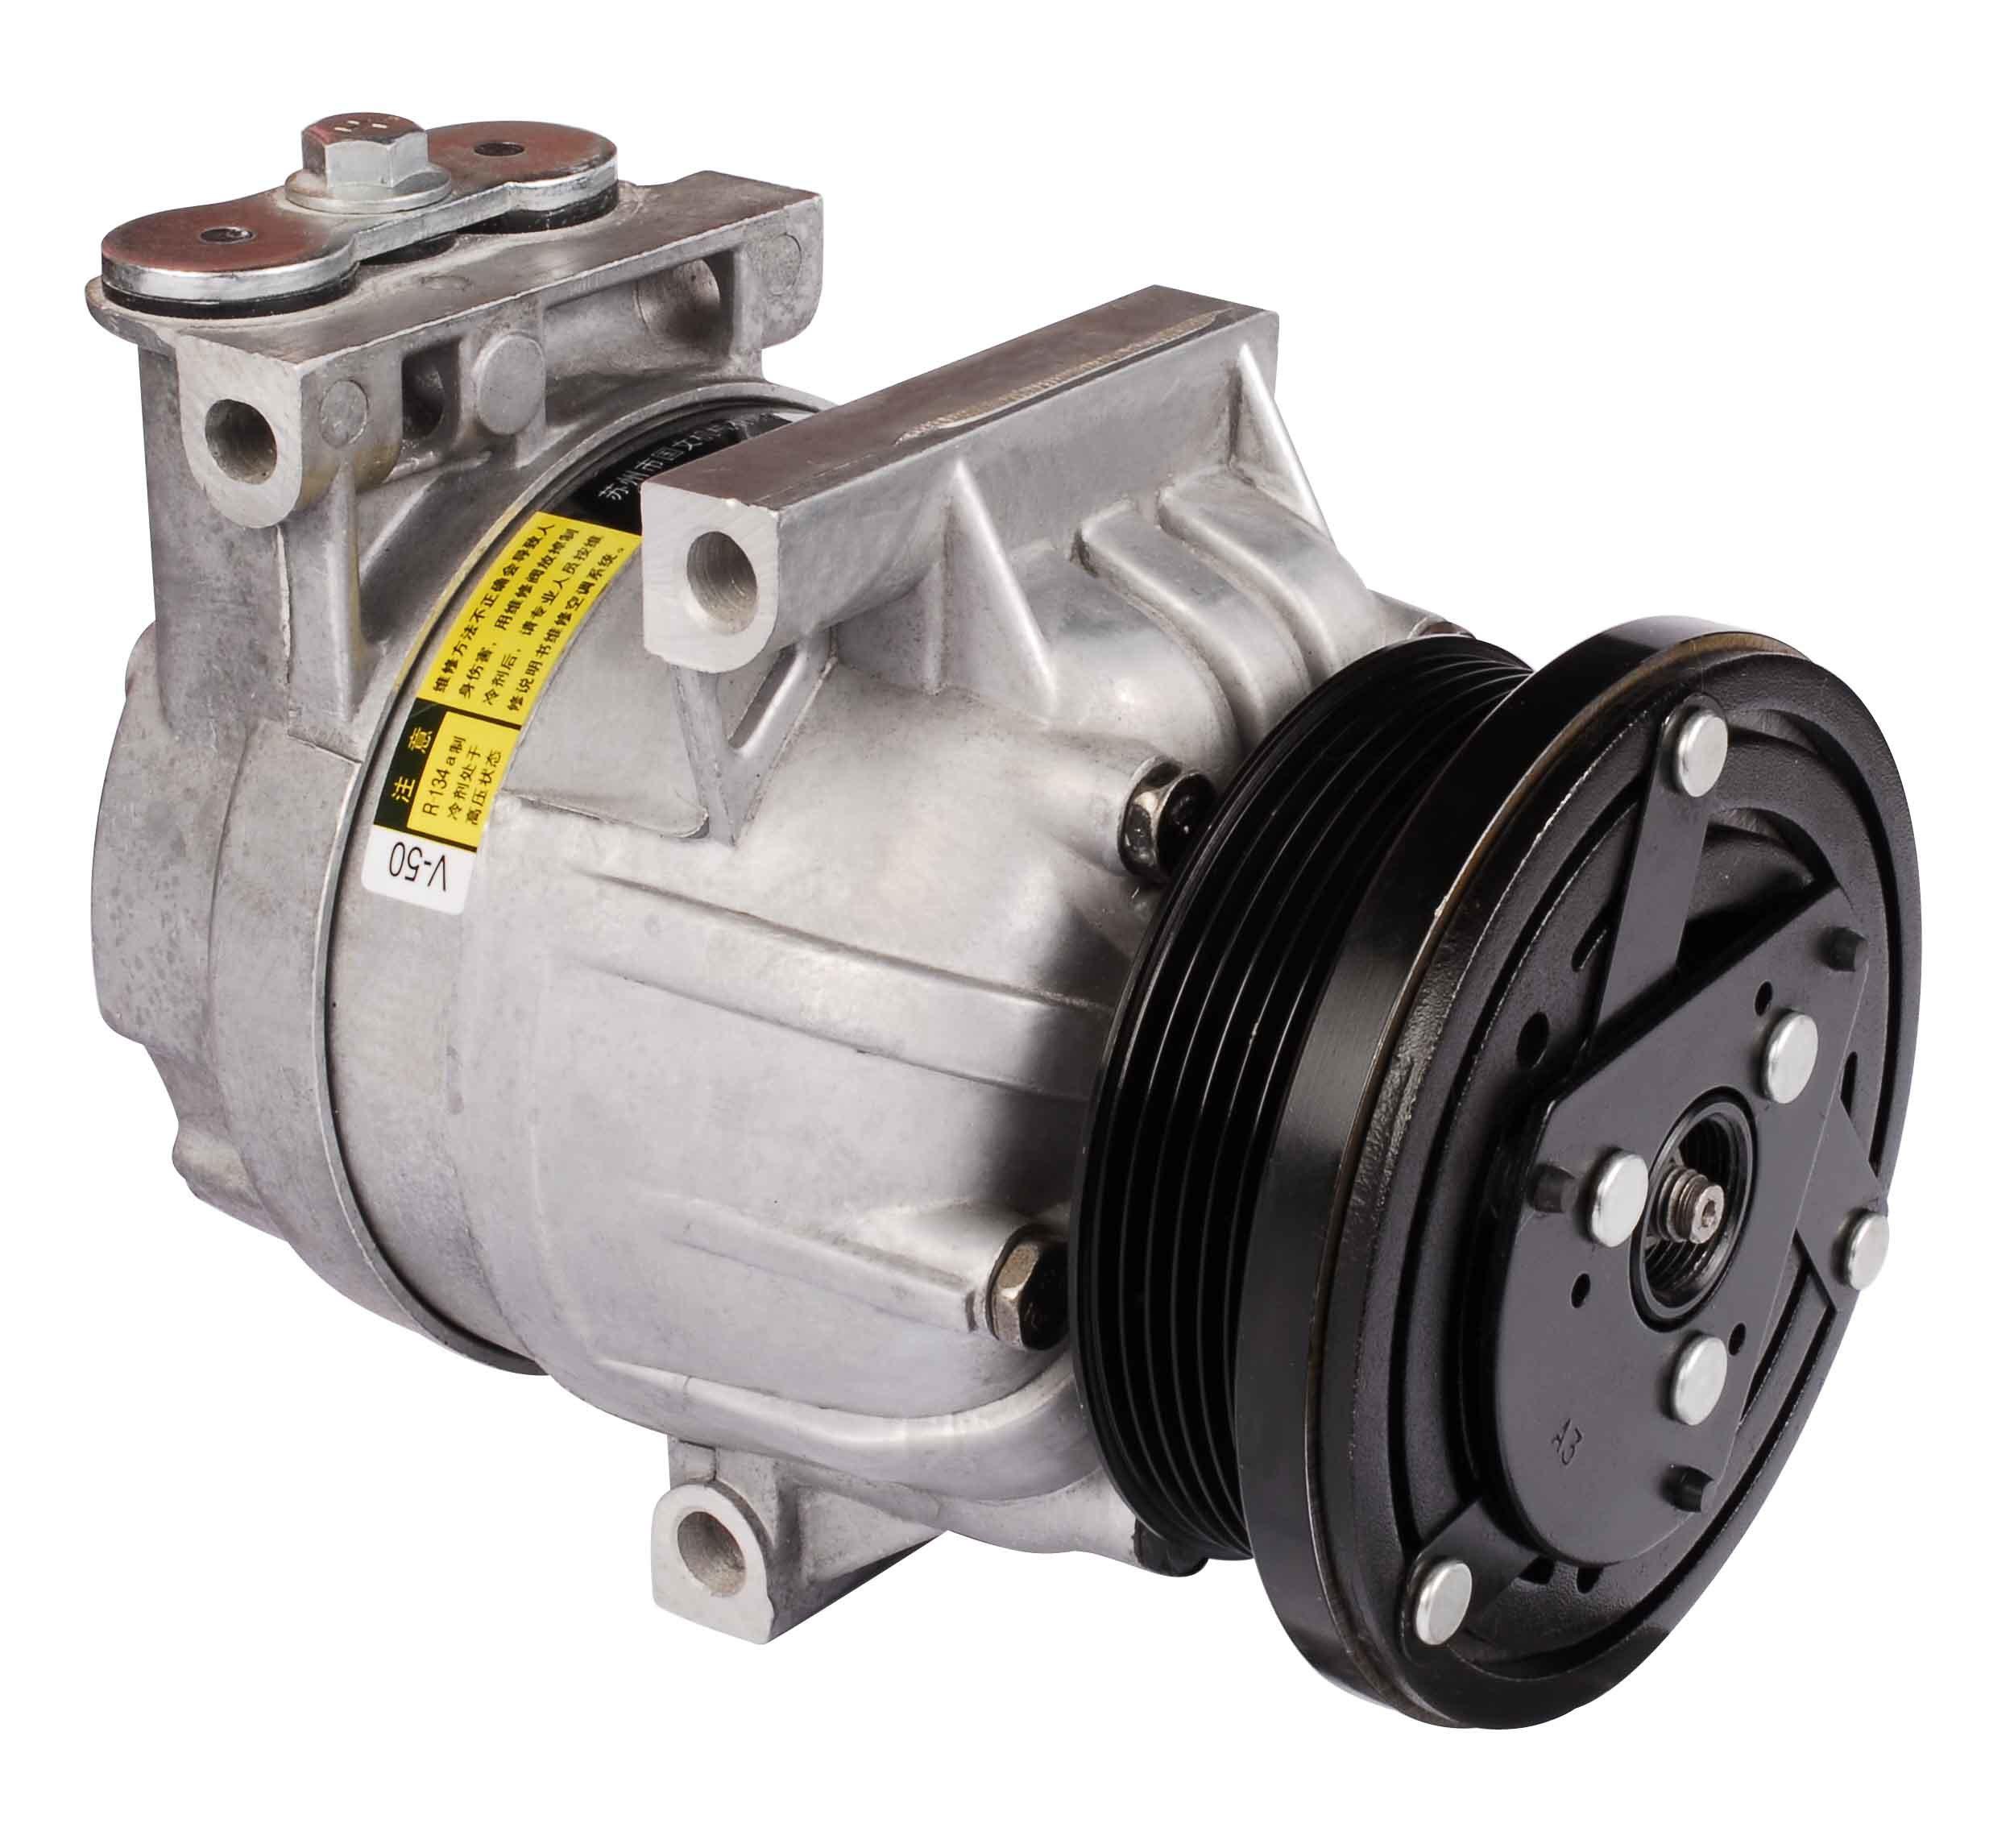 [Hot Item] 5V16 Car AC Air Compressor for Sale for Buick